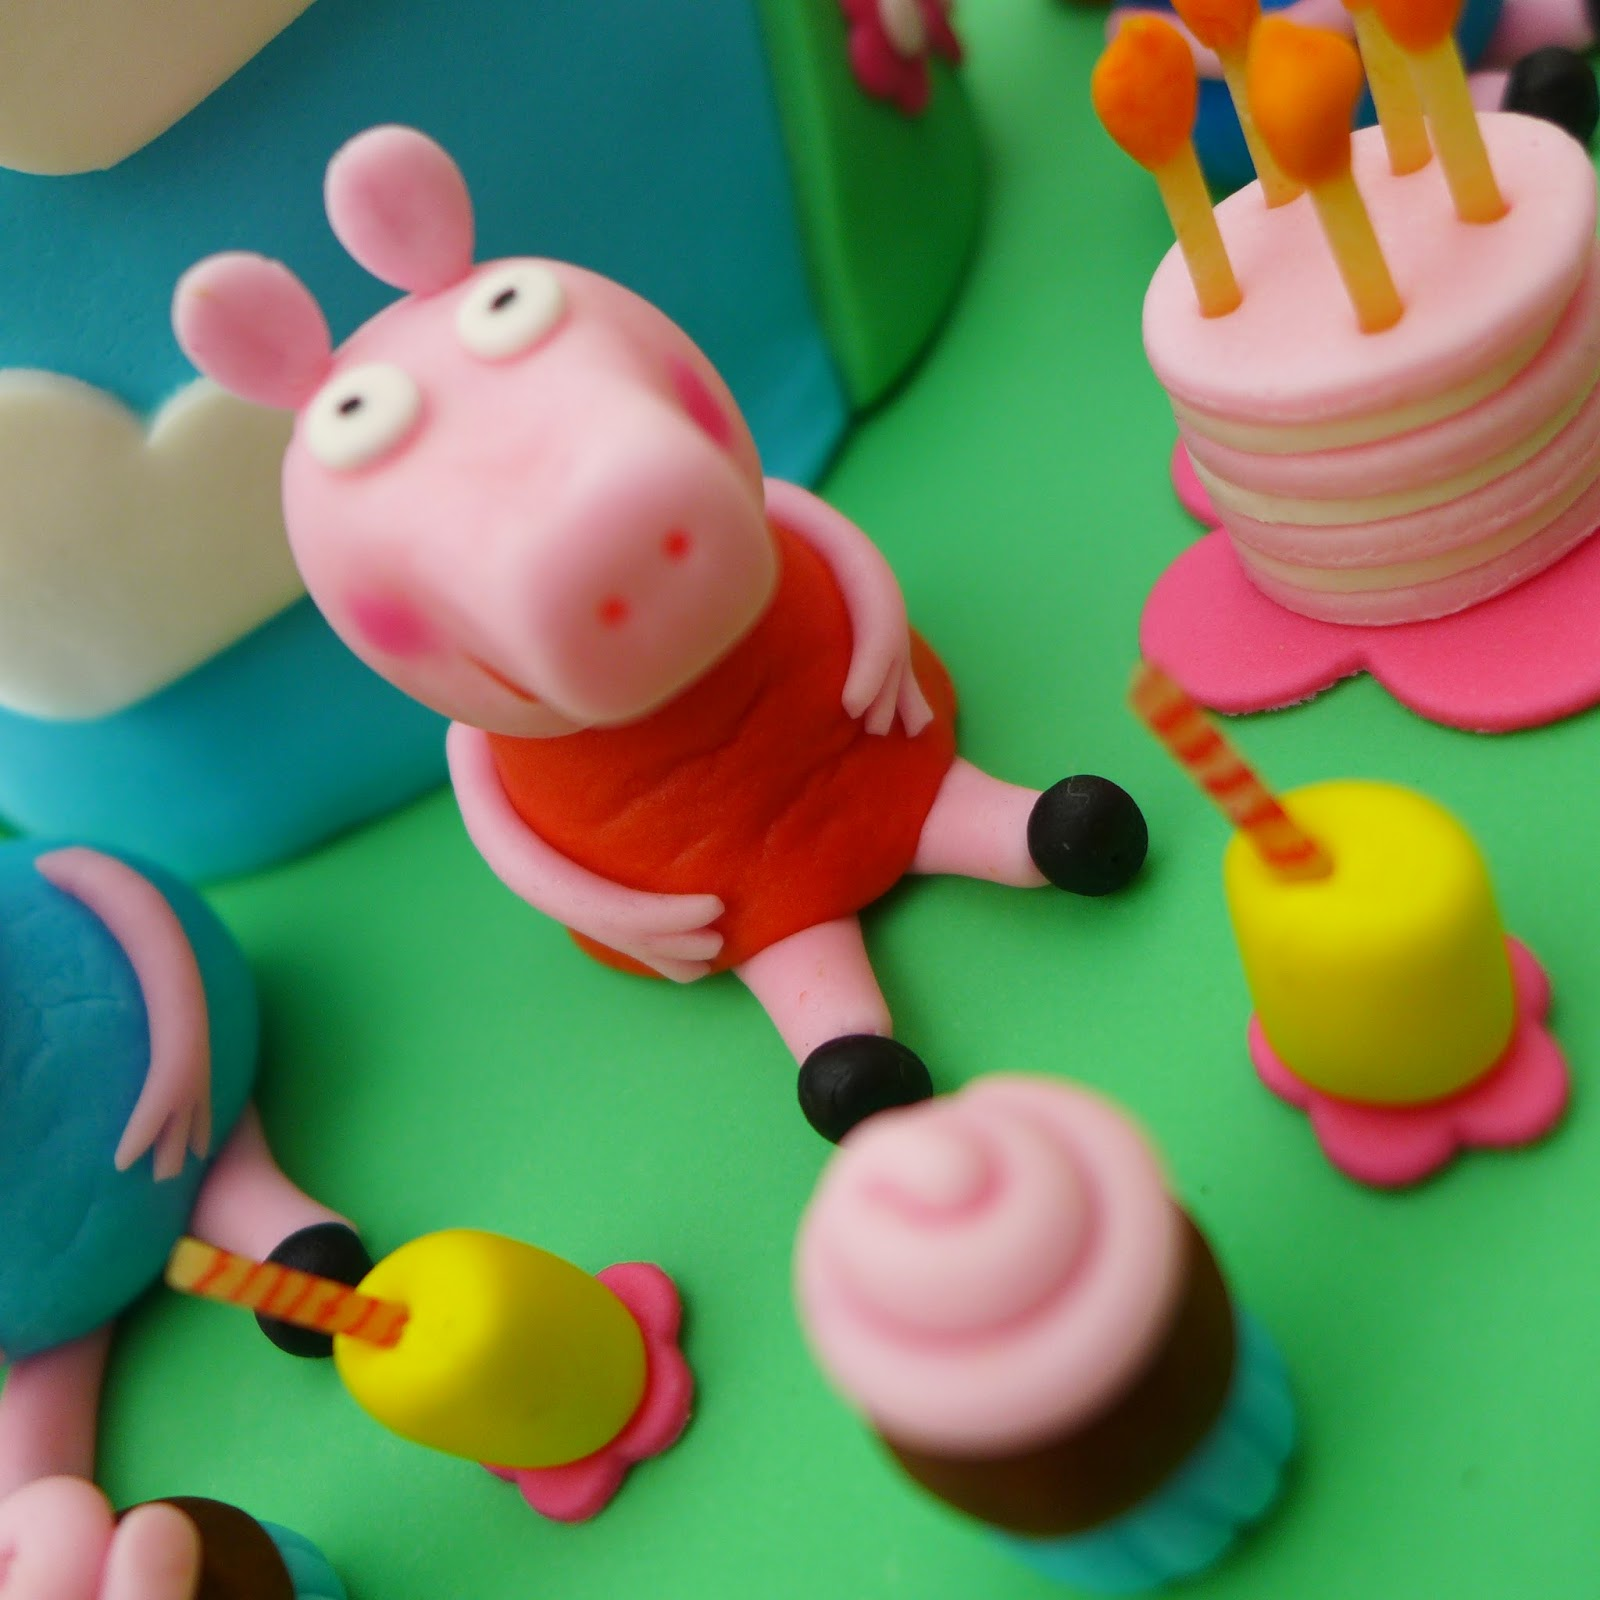 melissa and doug birthday cake